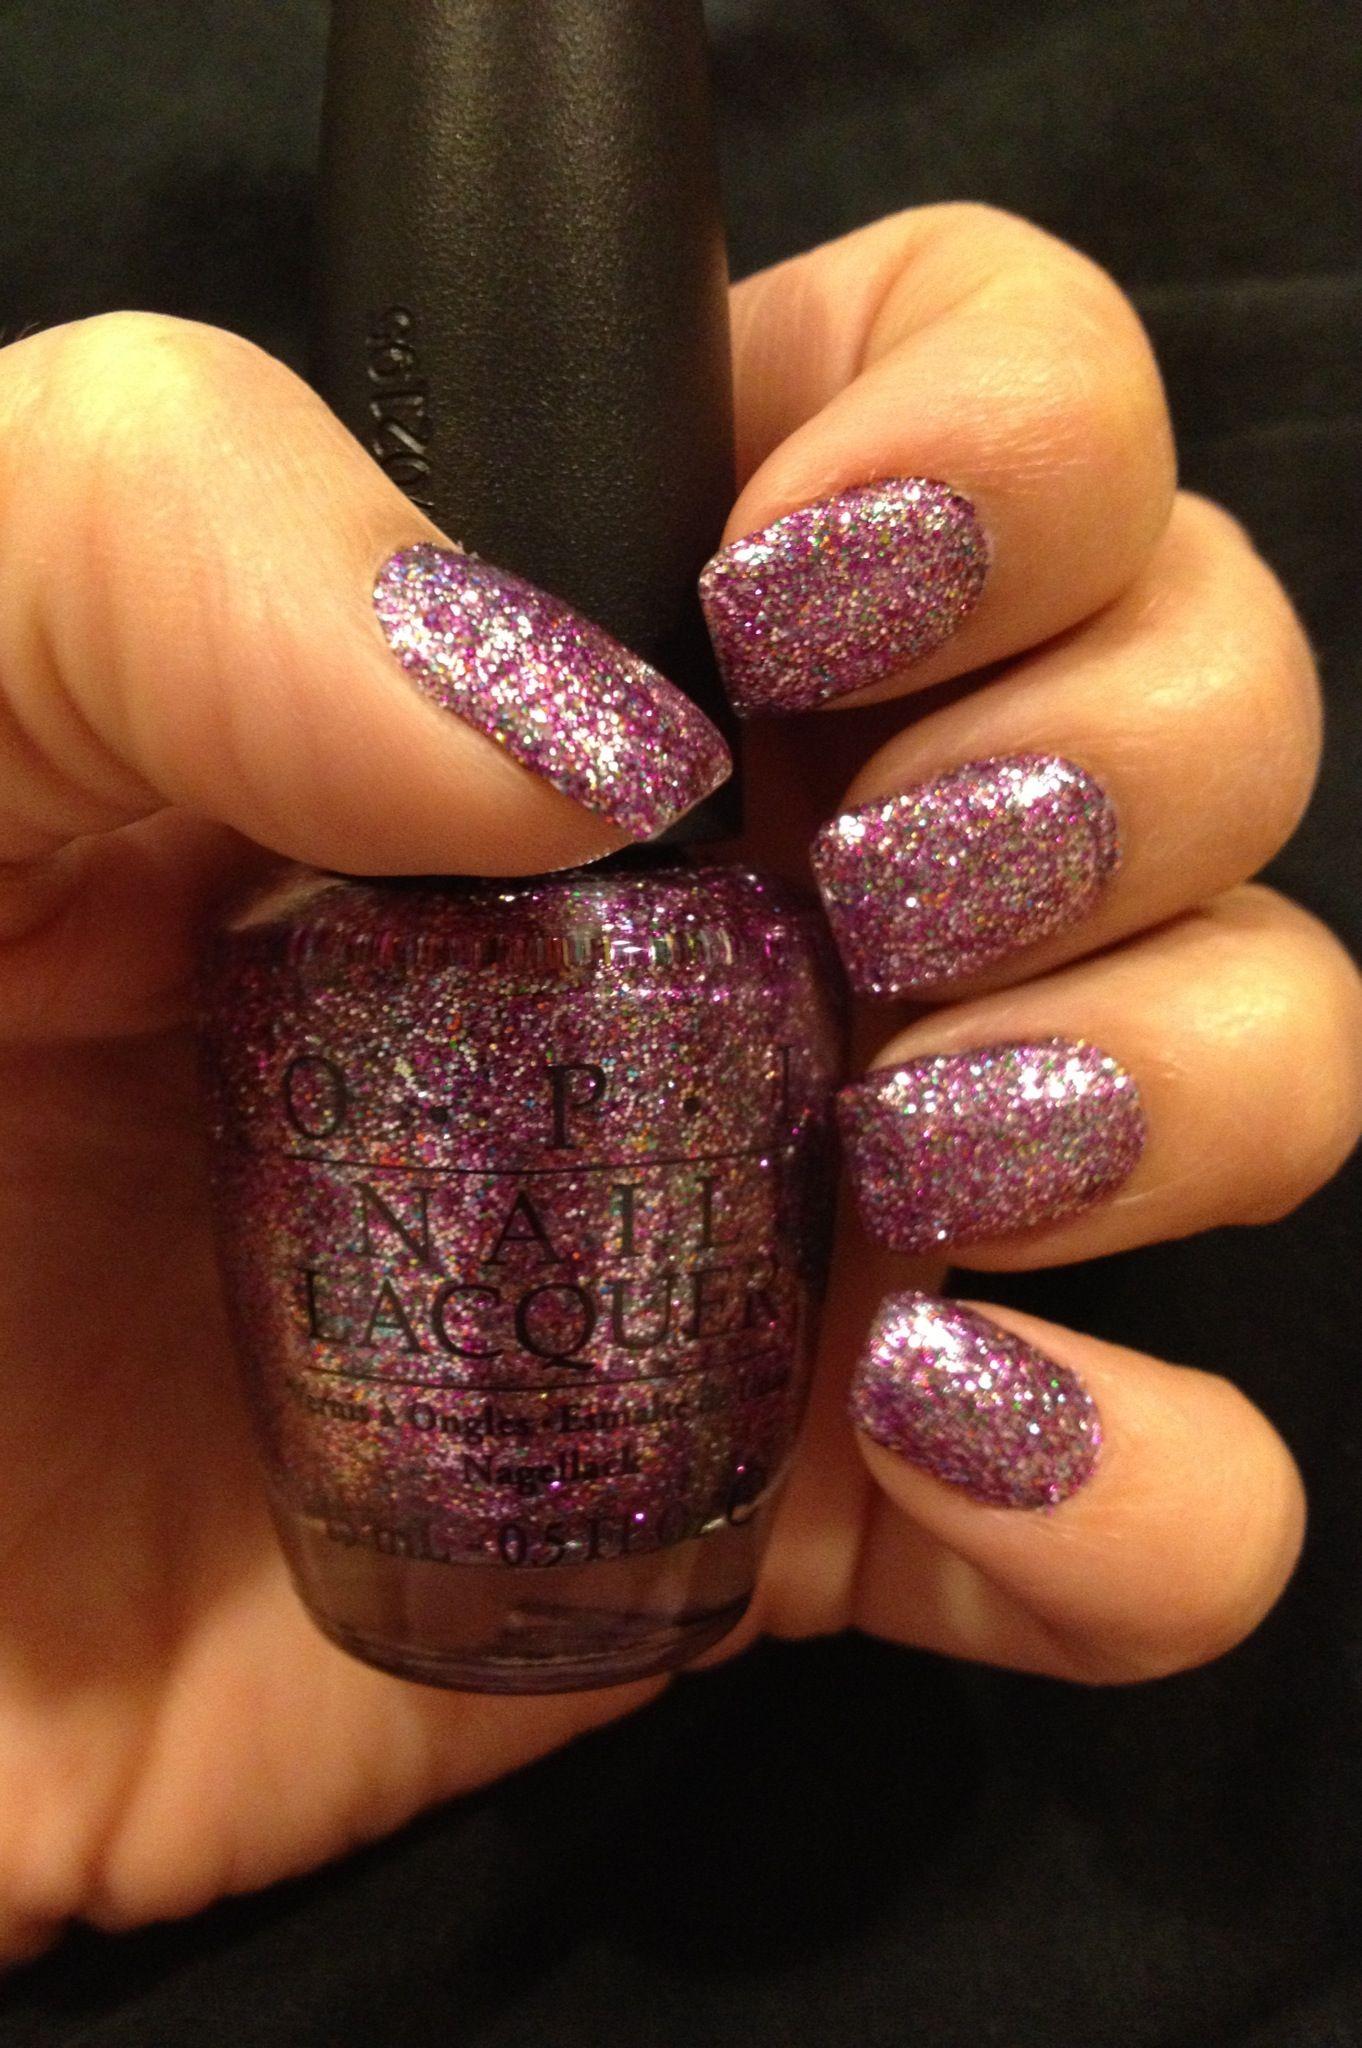 Glitter nails for New Years!!! | Nail designs | Pinterest | Glitter ...